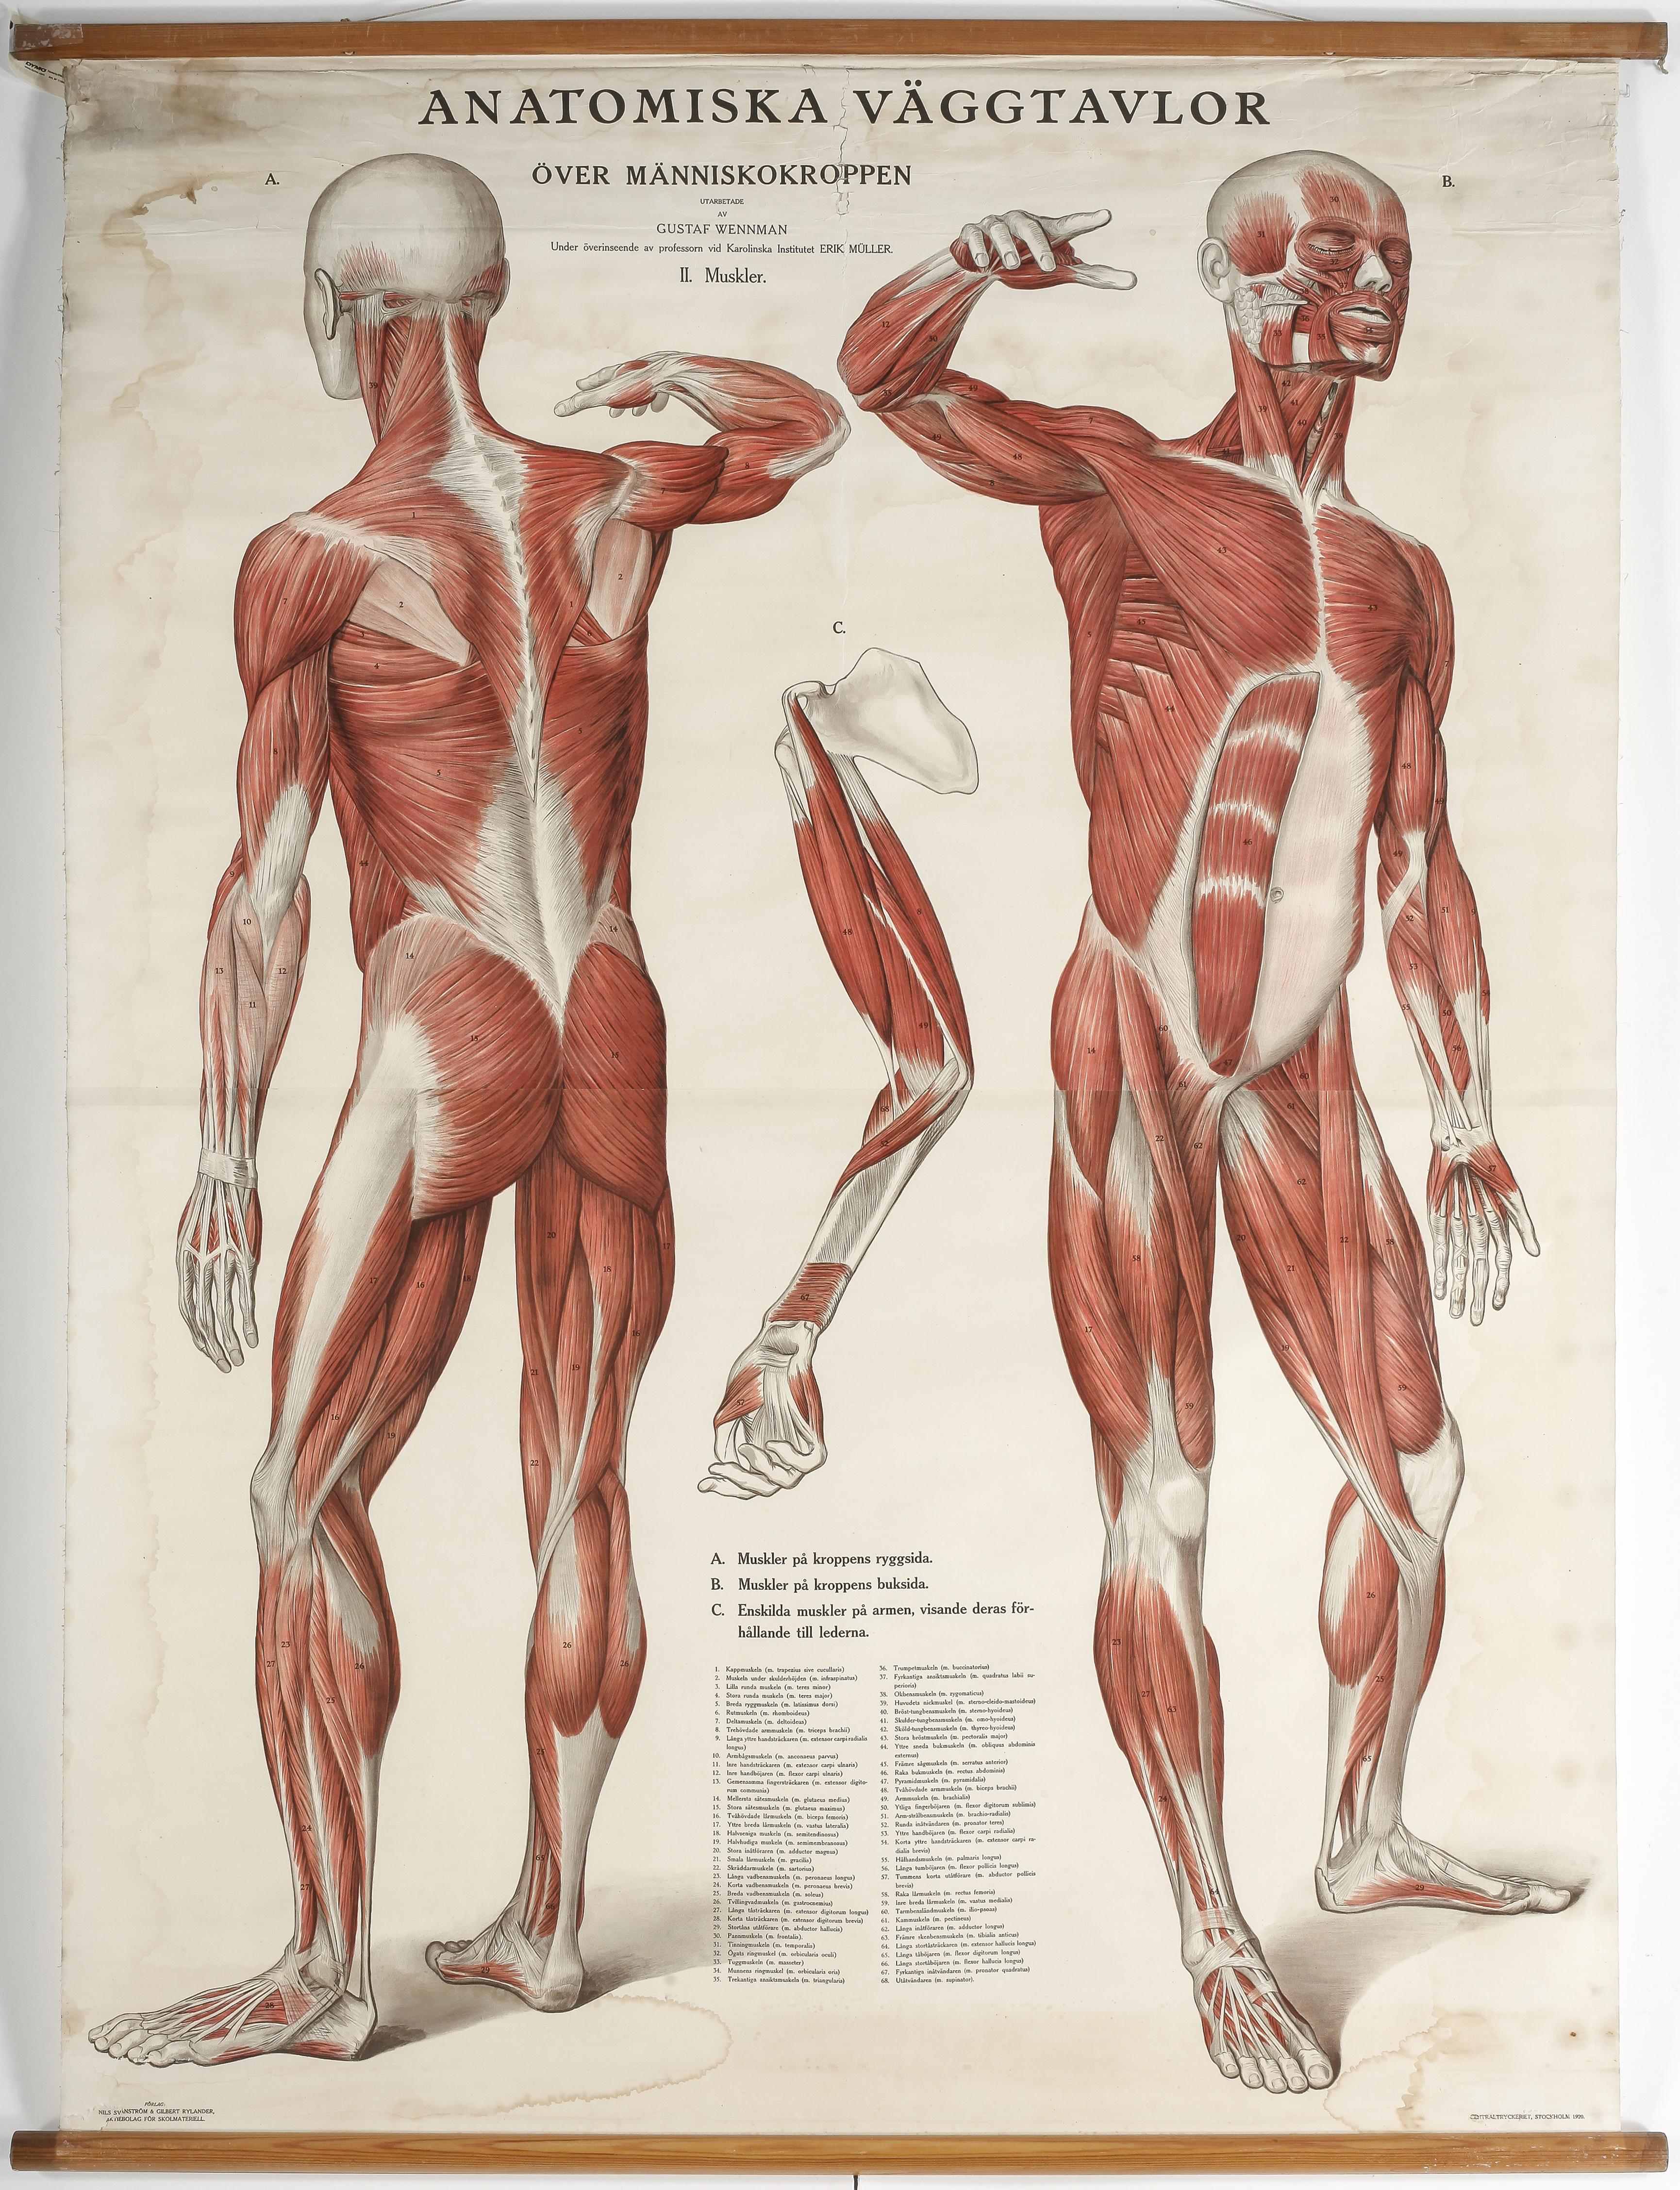 File:Gustaf Wennman-Anatomical poster.jpg - Wikimedia Commons